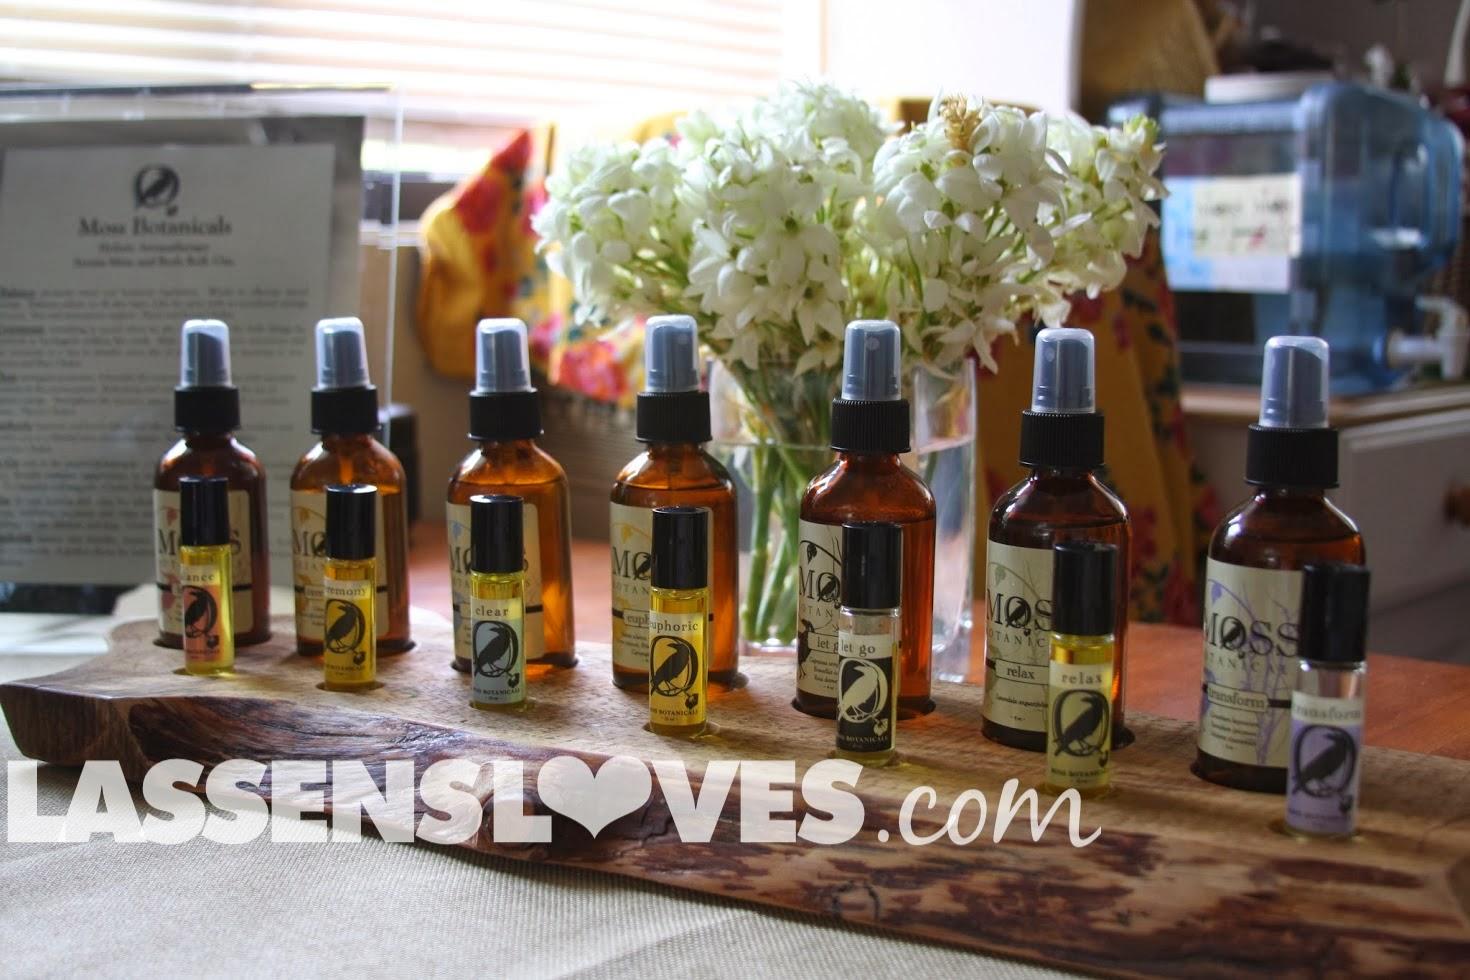 lassensloves.com, Lassen's, Lassens, Moss+Botanicals, Aromatherapy